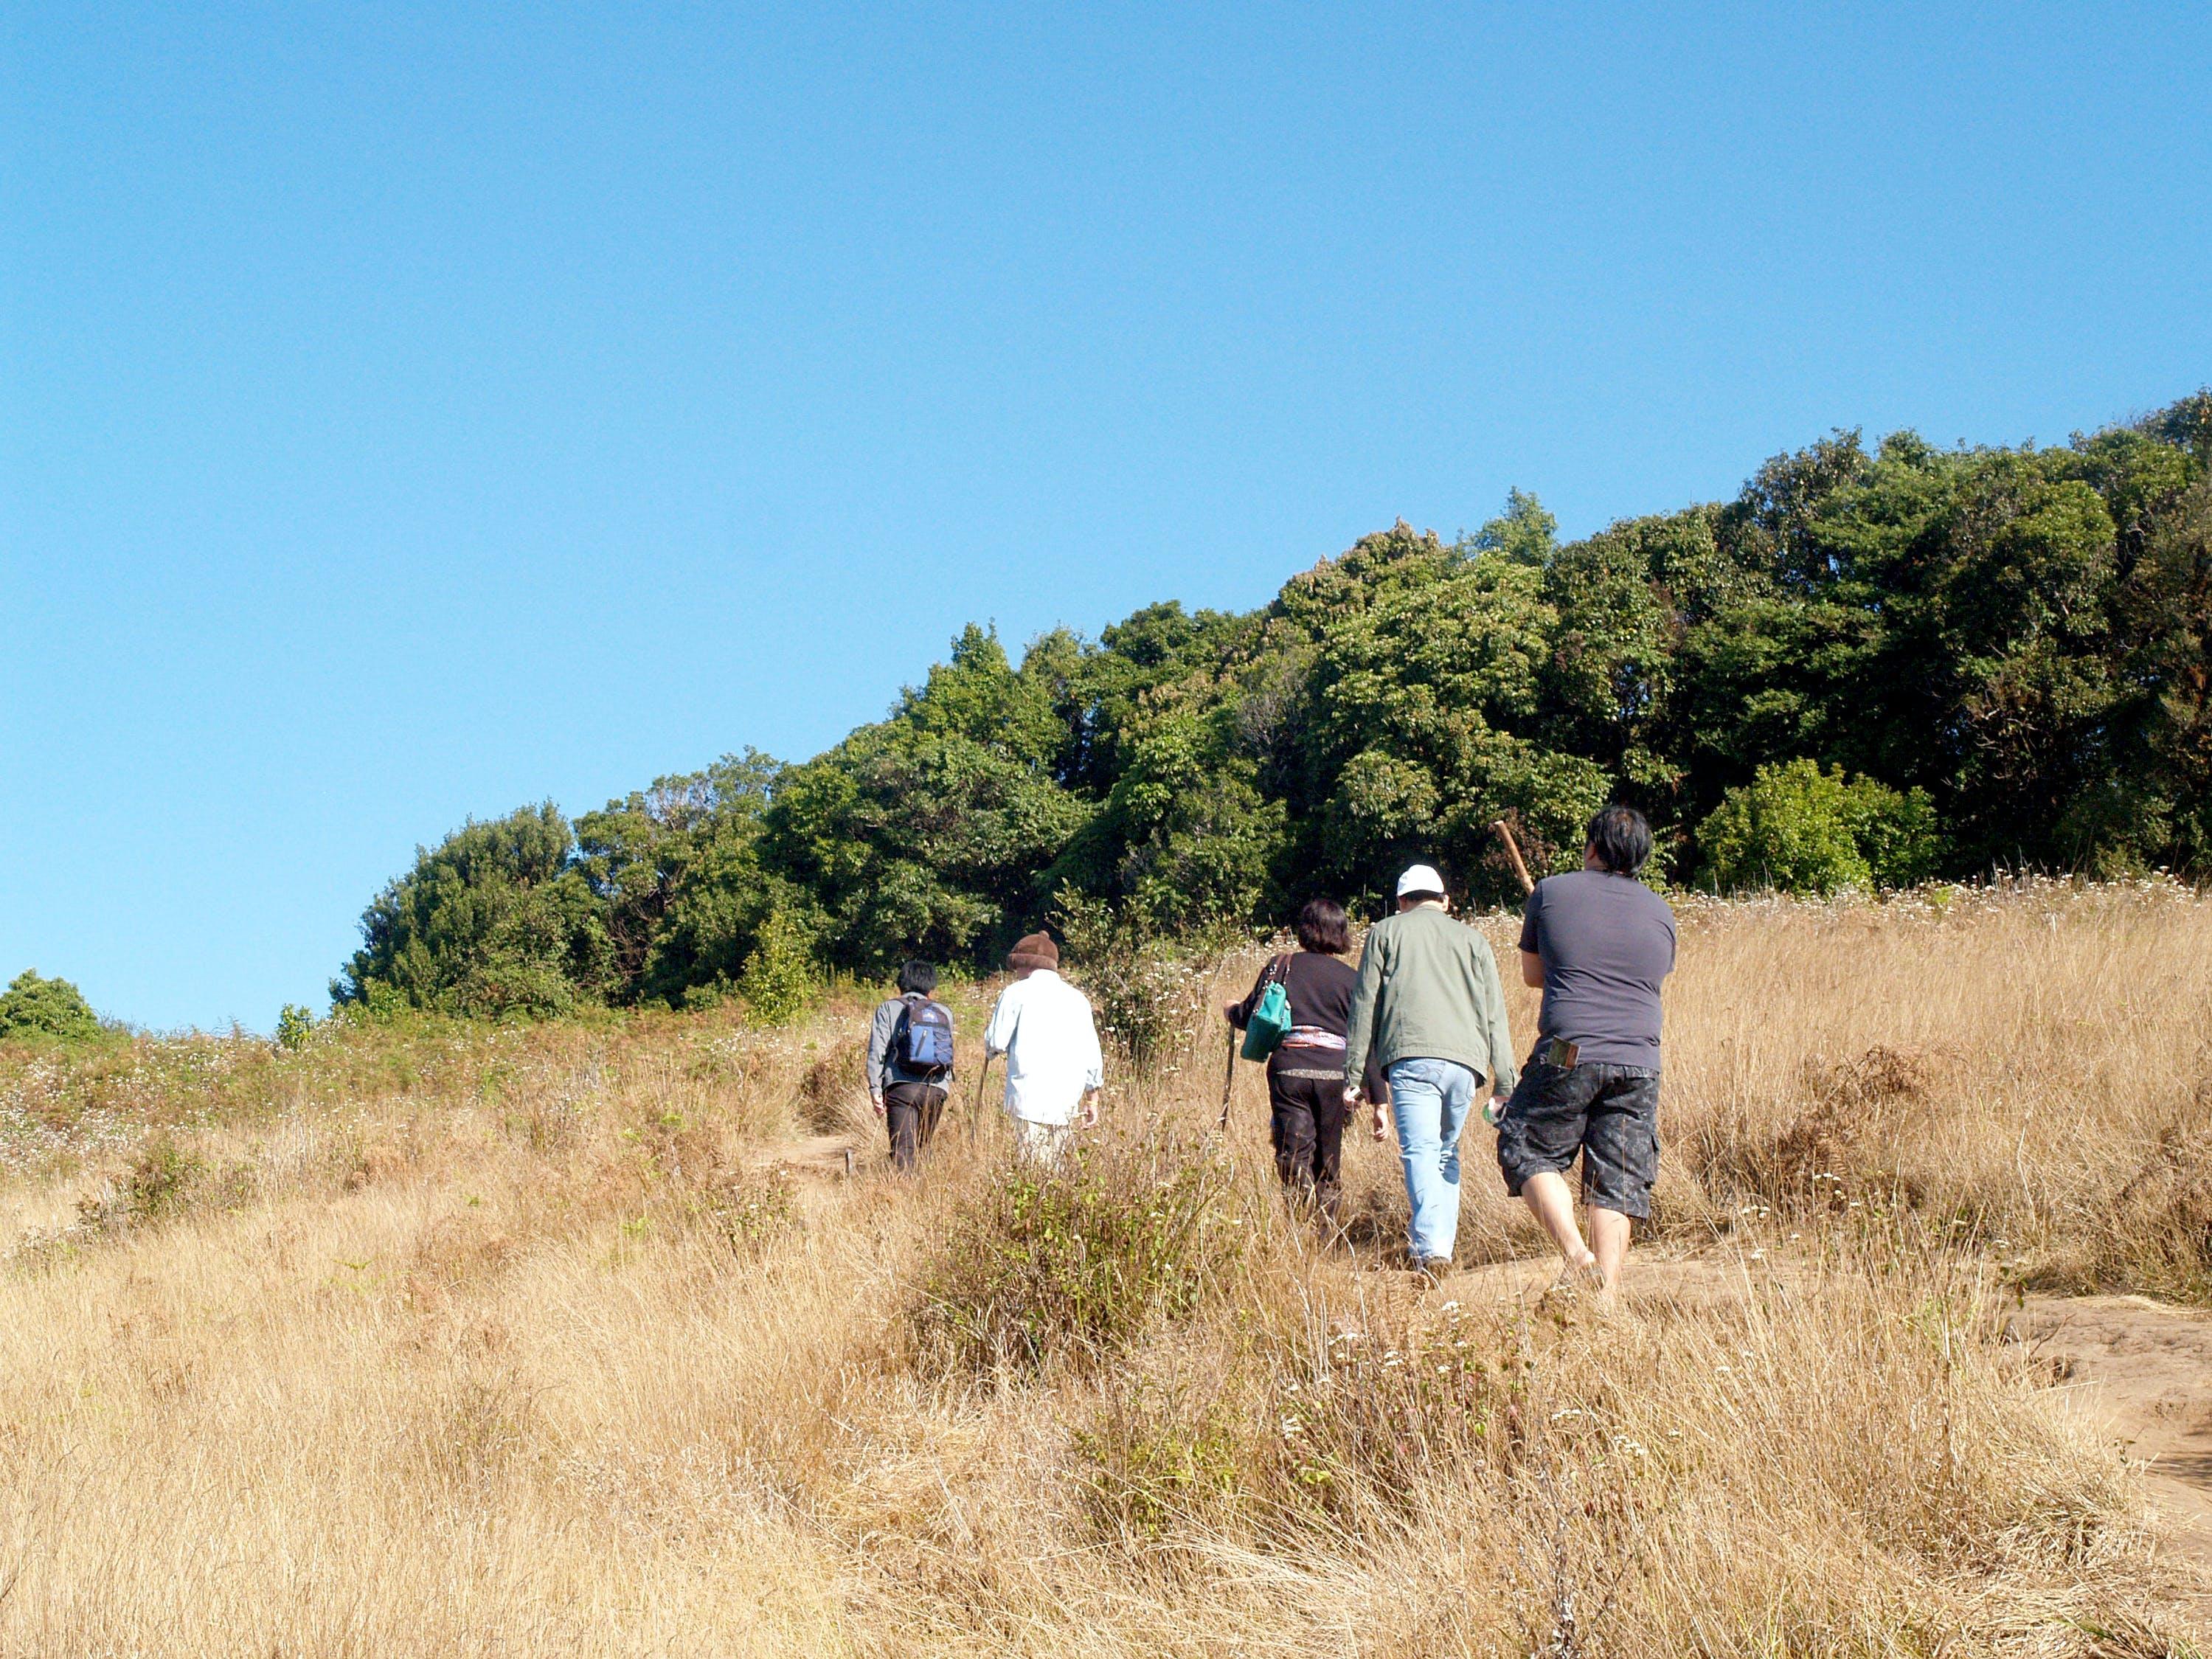 Free stock photo of nature, field, bush, trees